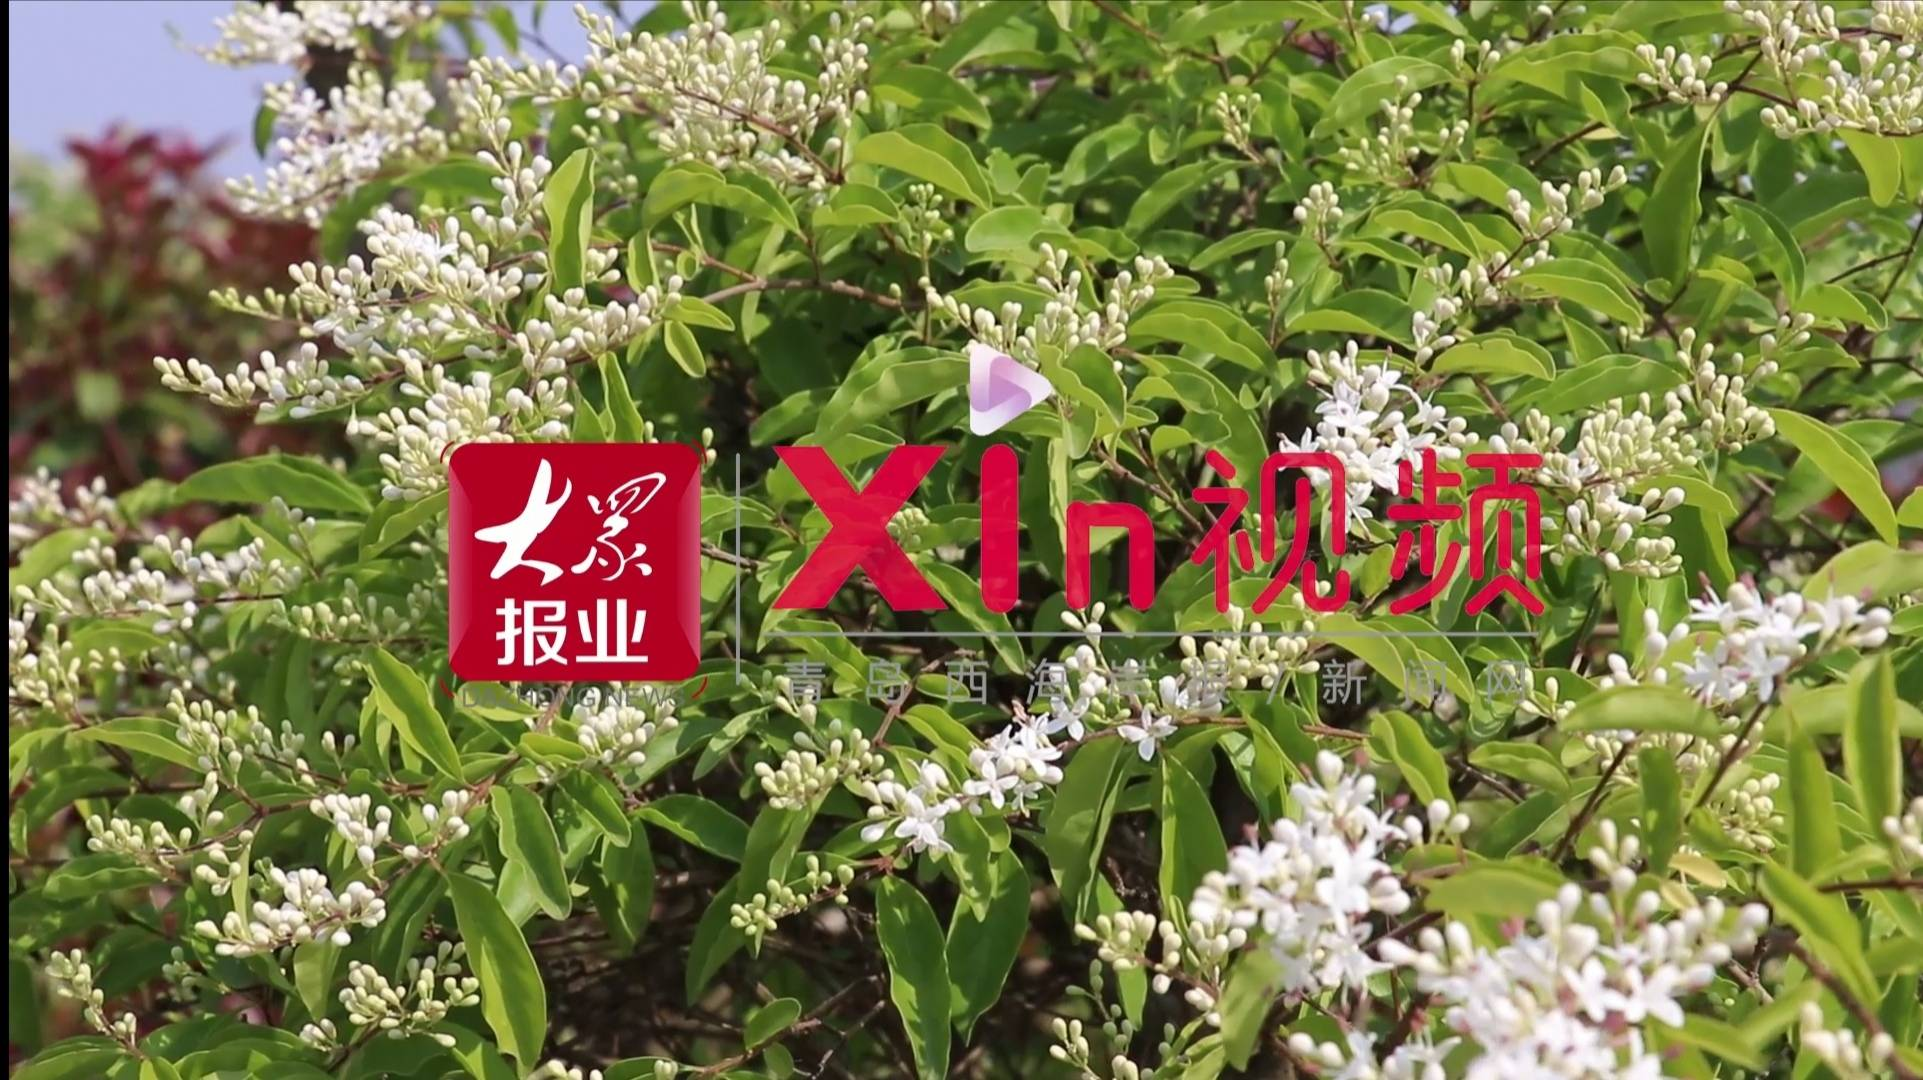 Xin视频丨美丽乡村入画来